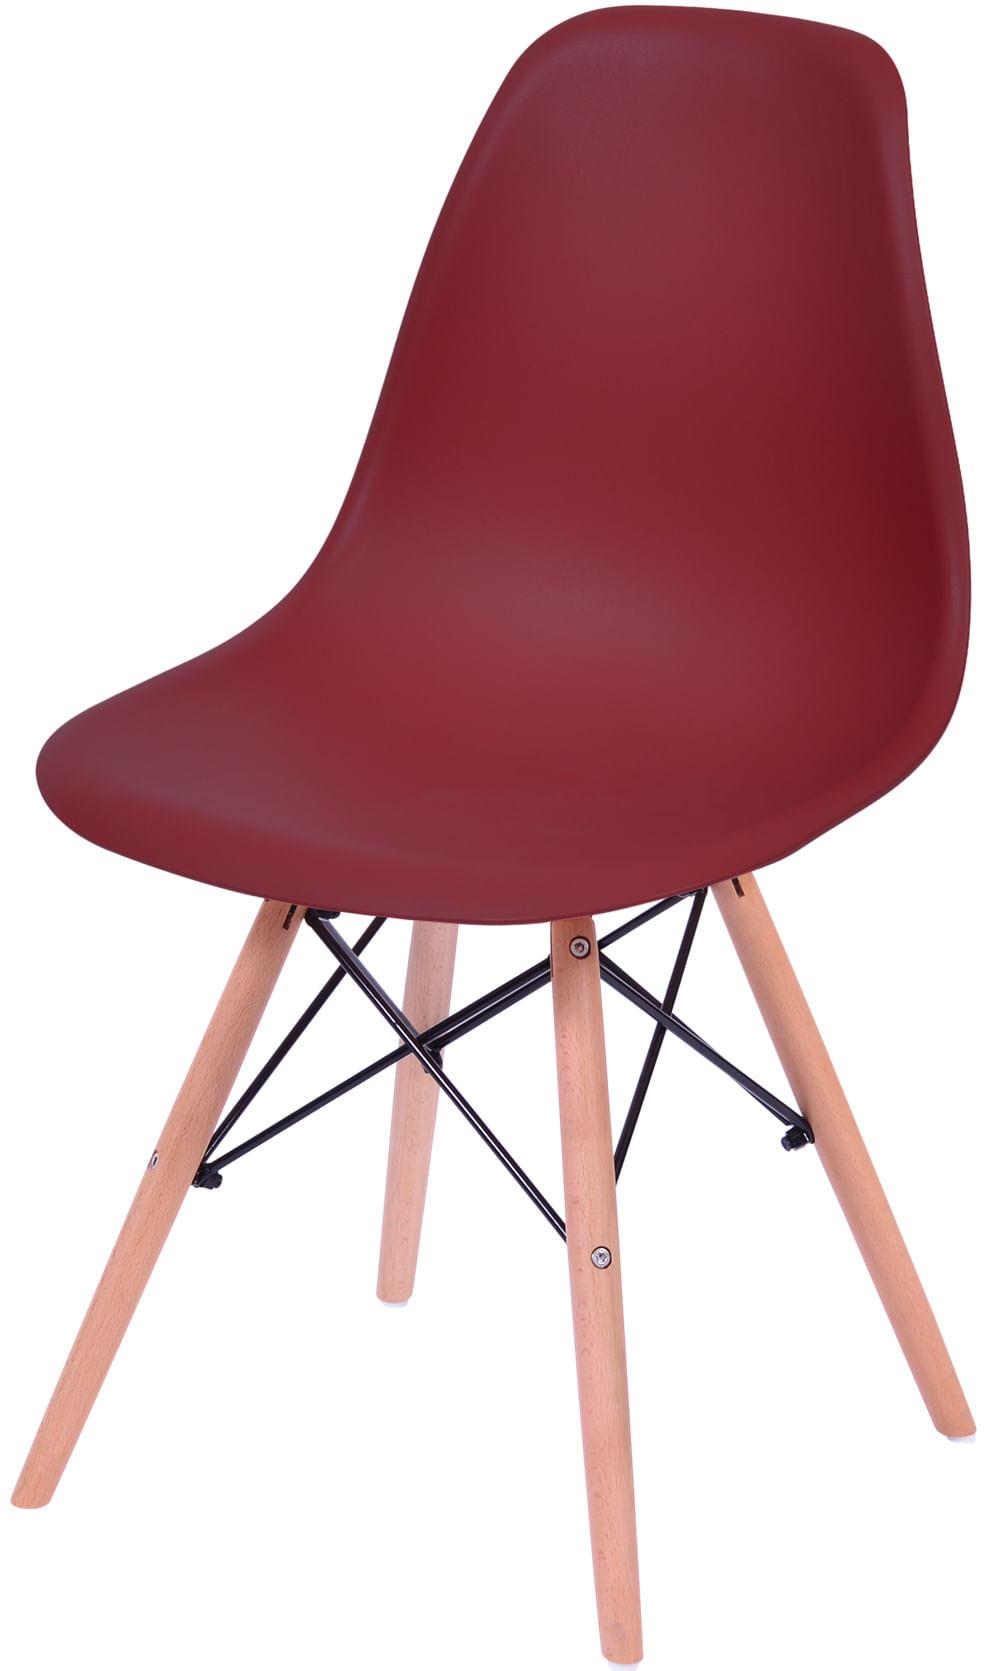 Cadeira Eames Polipropileno Vinho Base Madeira - 43035